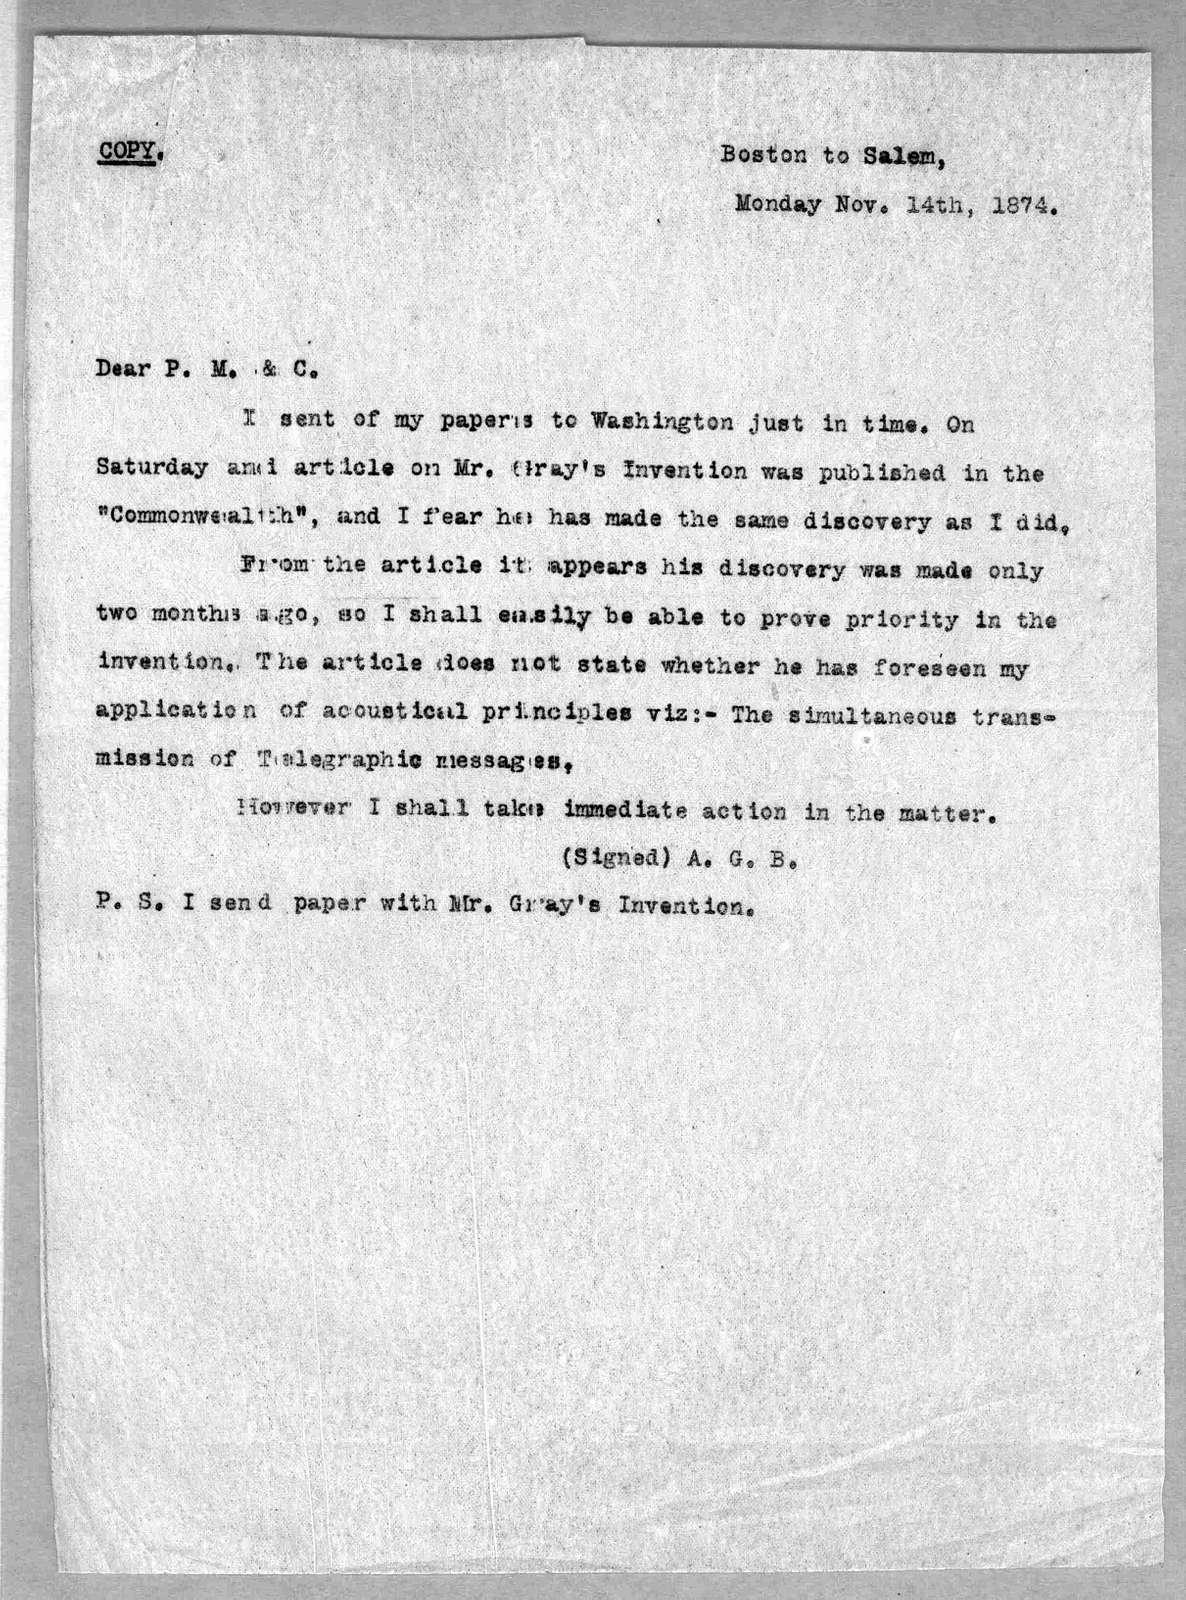 Letter from Alexander Graham Bell to Alexander Melville Bell, Eliza Symonds Bell, Carrie Bell, November 14, 1874